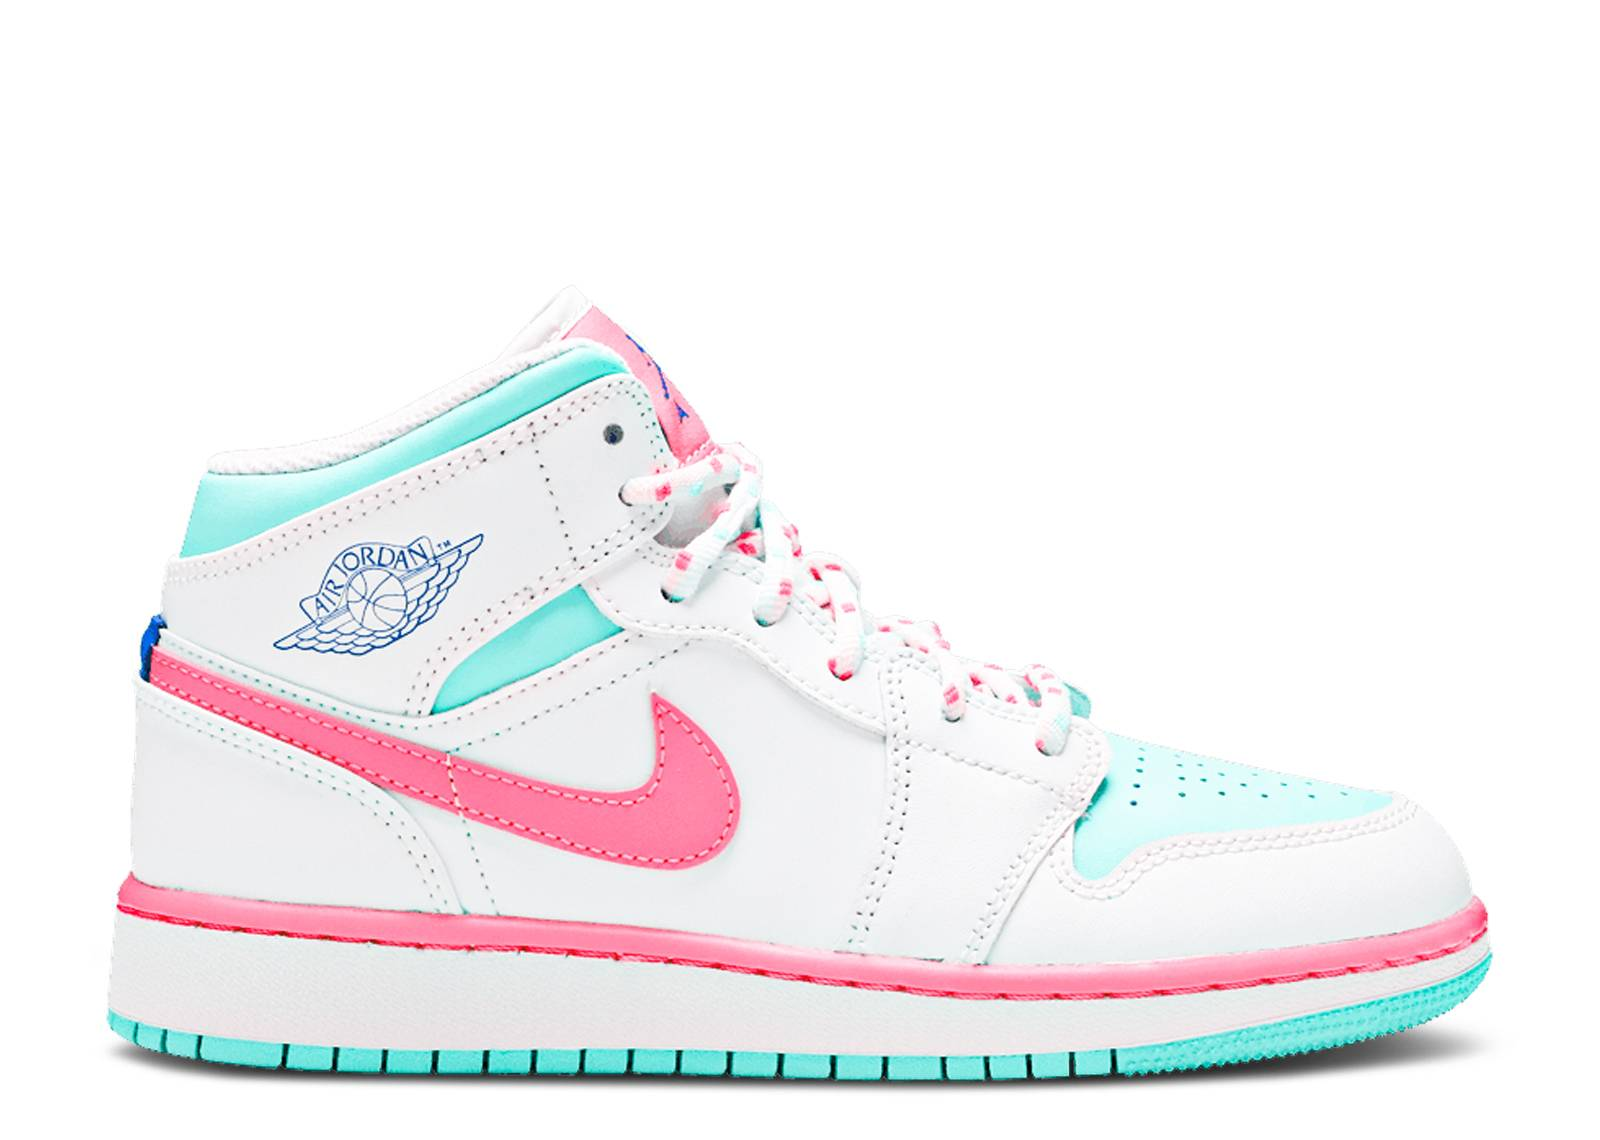 Air Jordan 1 Mid Gs Digital Pink Air Jordan 555112 102